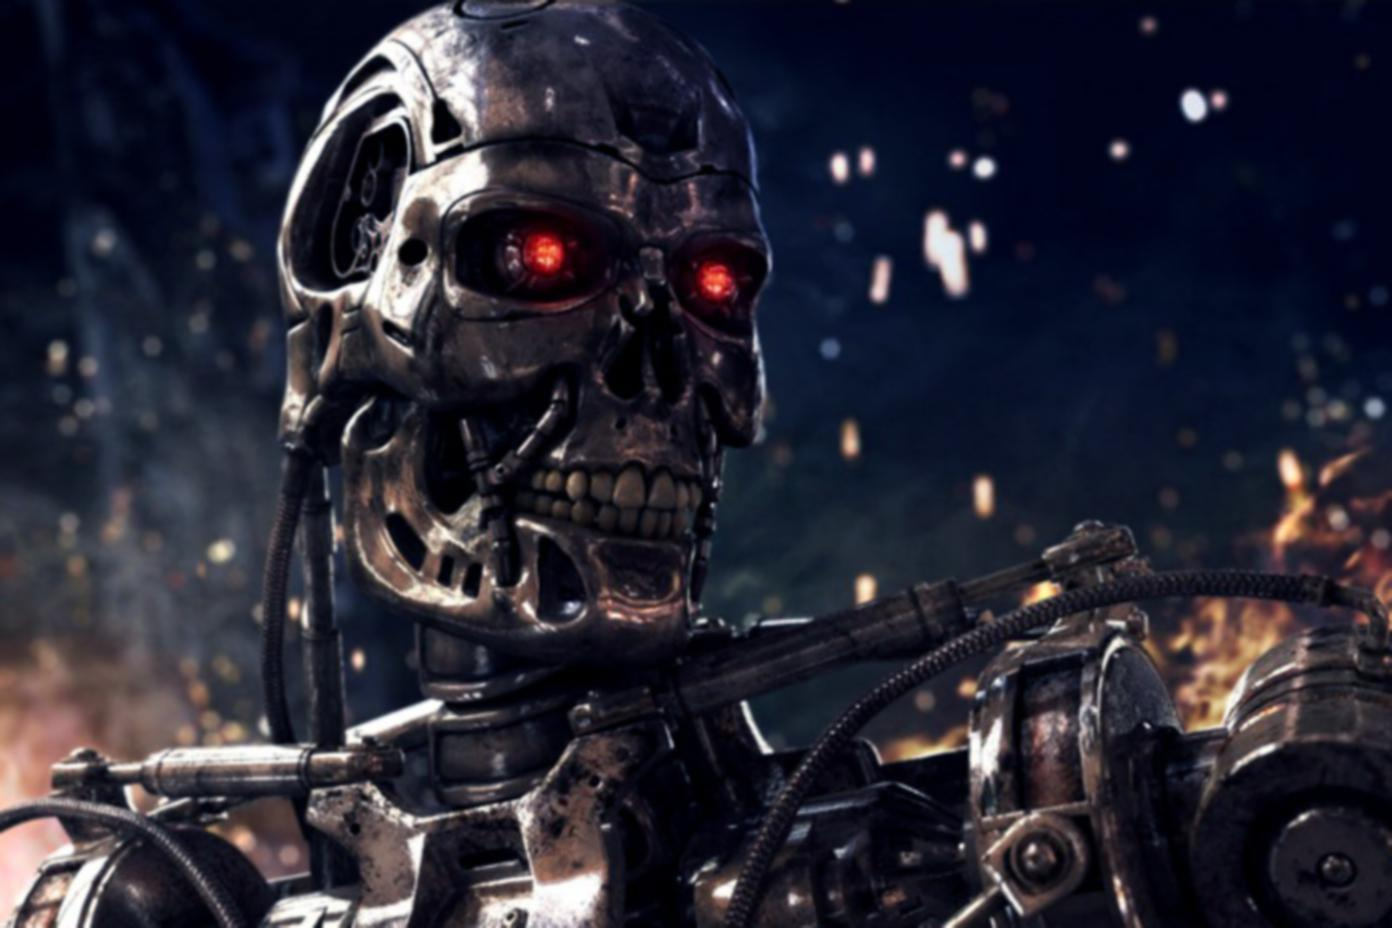 Terminator 6 Report Reveals Dani Ramos Details And Mexico